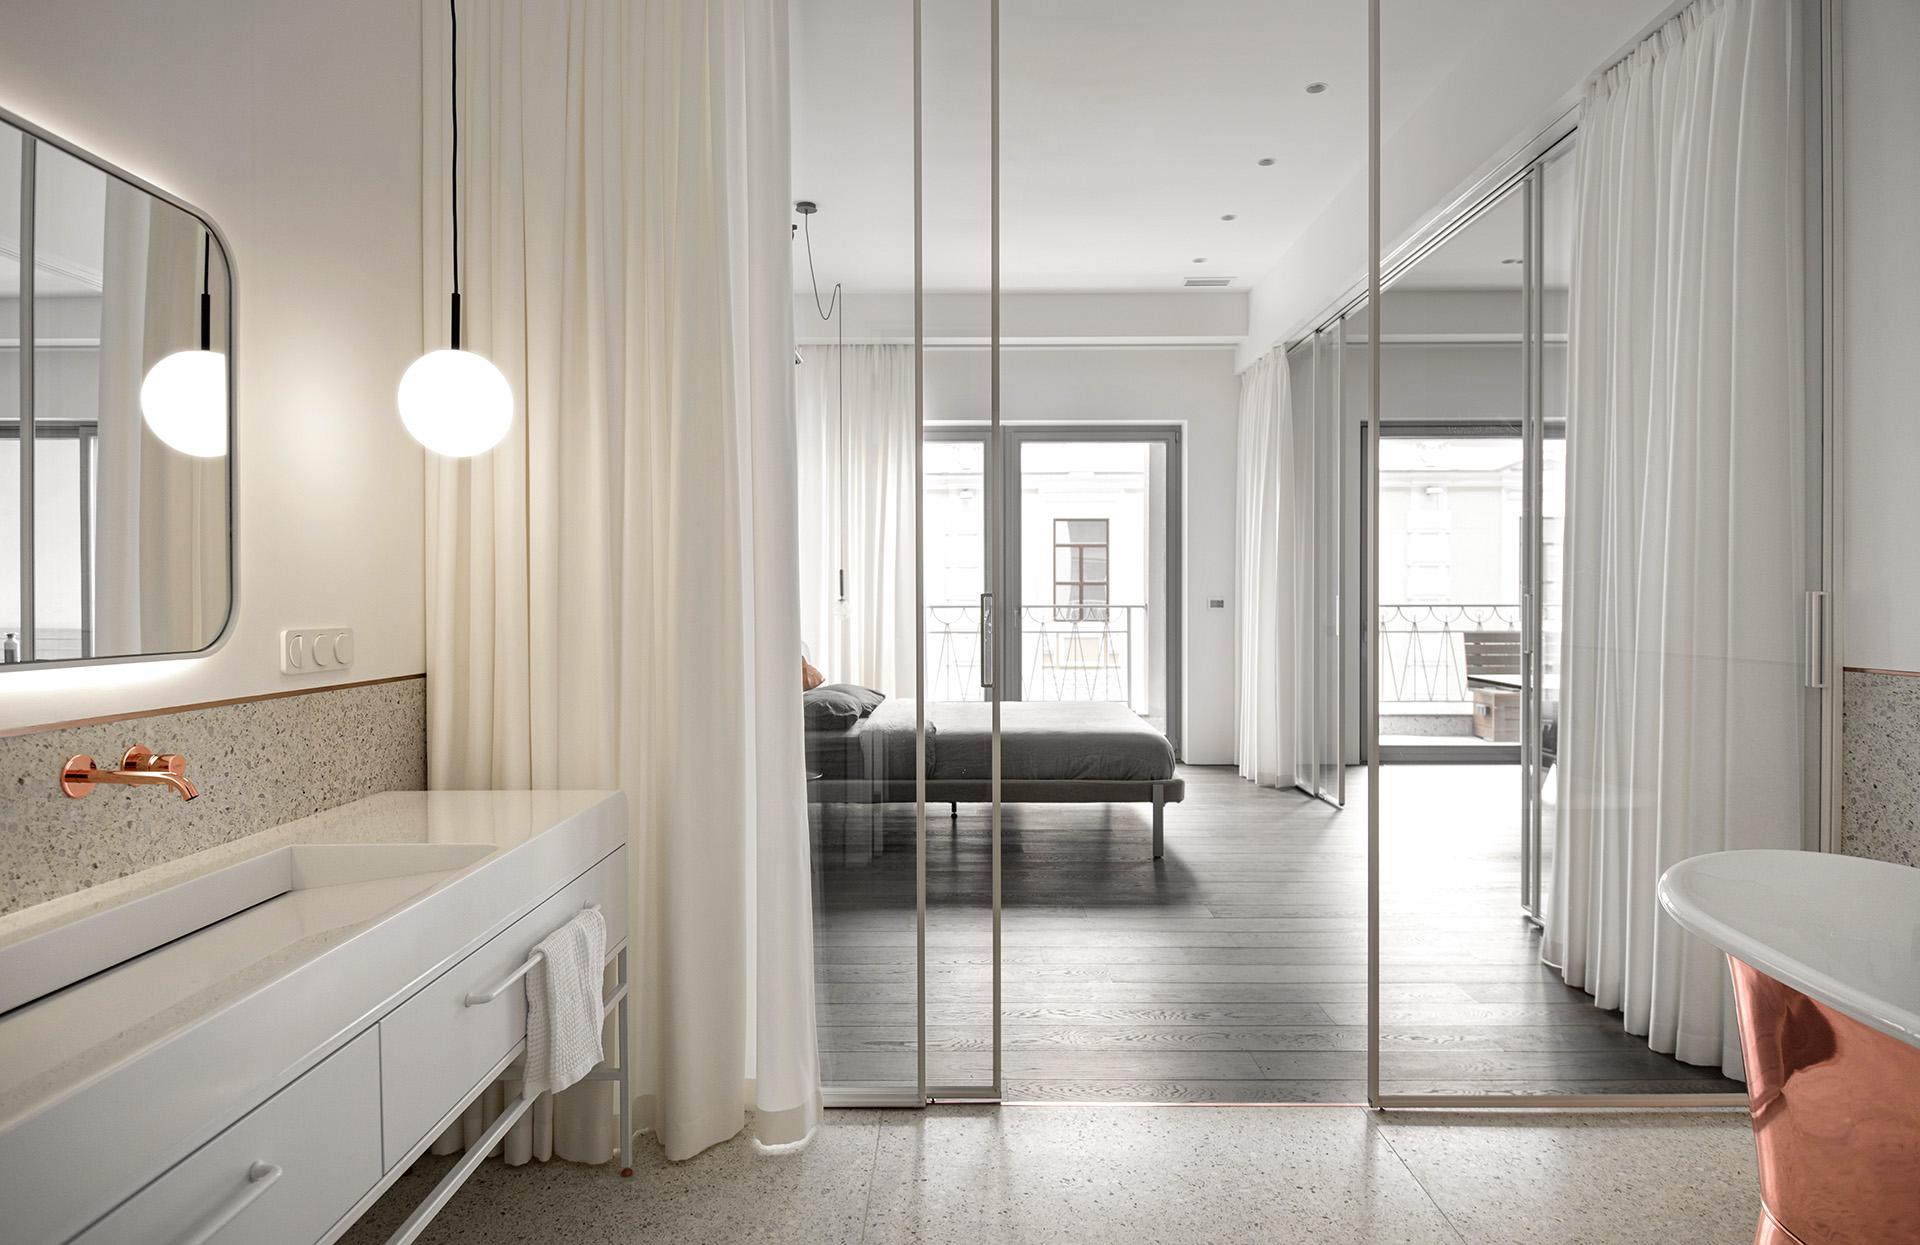 Interiér MFN - byt v Petrohrade po rekonštrukcii